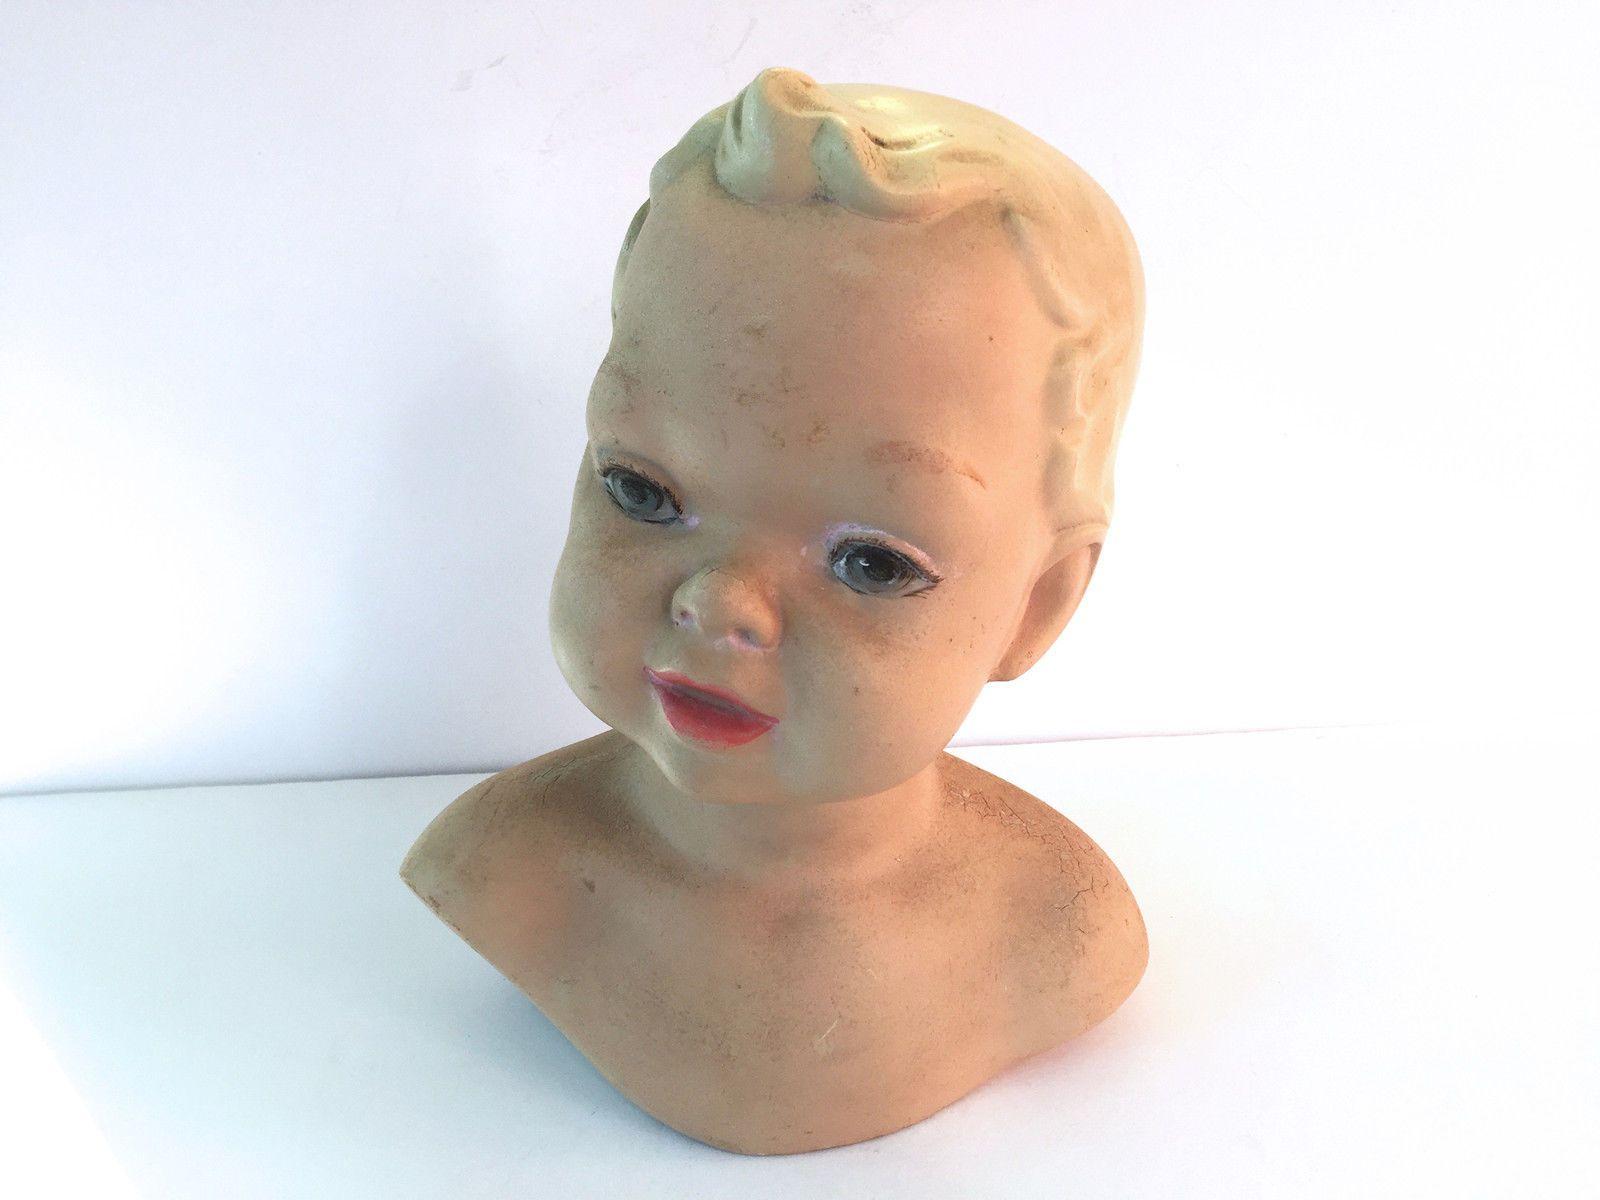 Vintage 30 S 40 50 Child Baby Toddler Mannequin Head